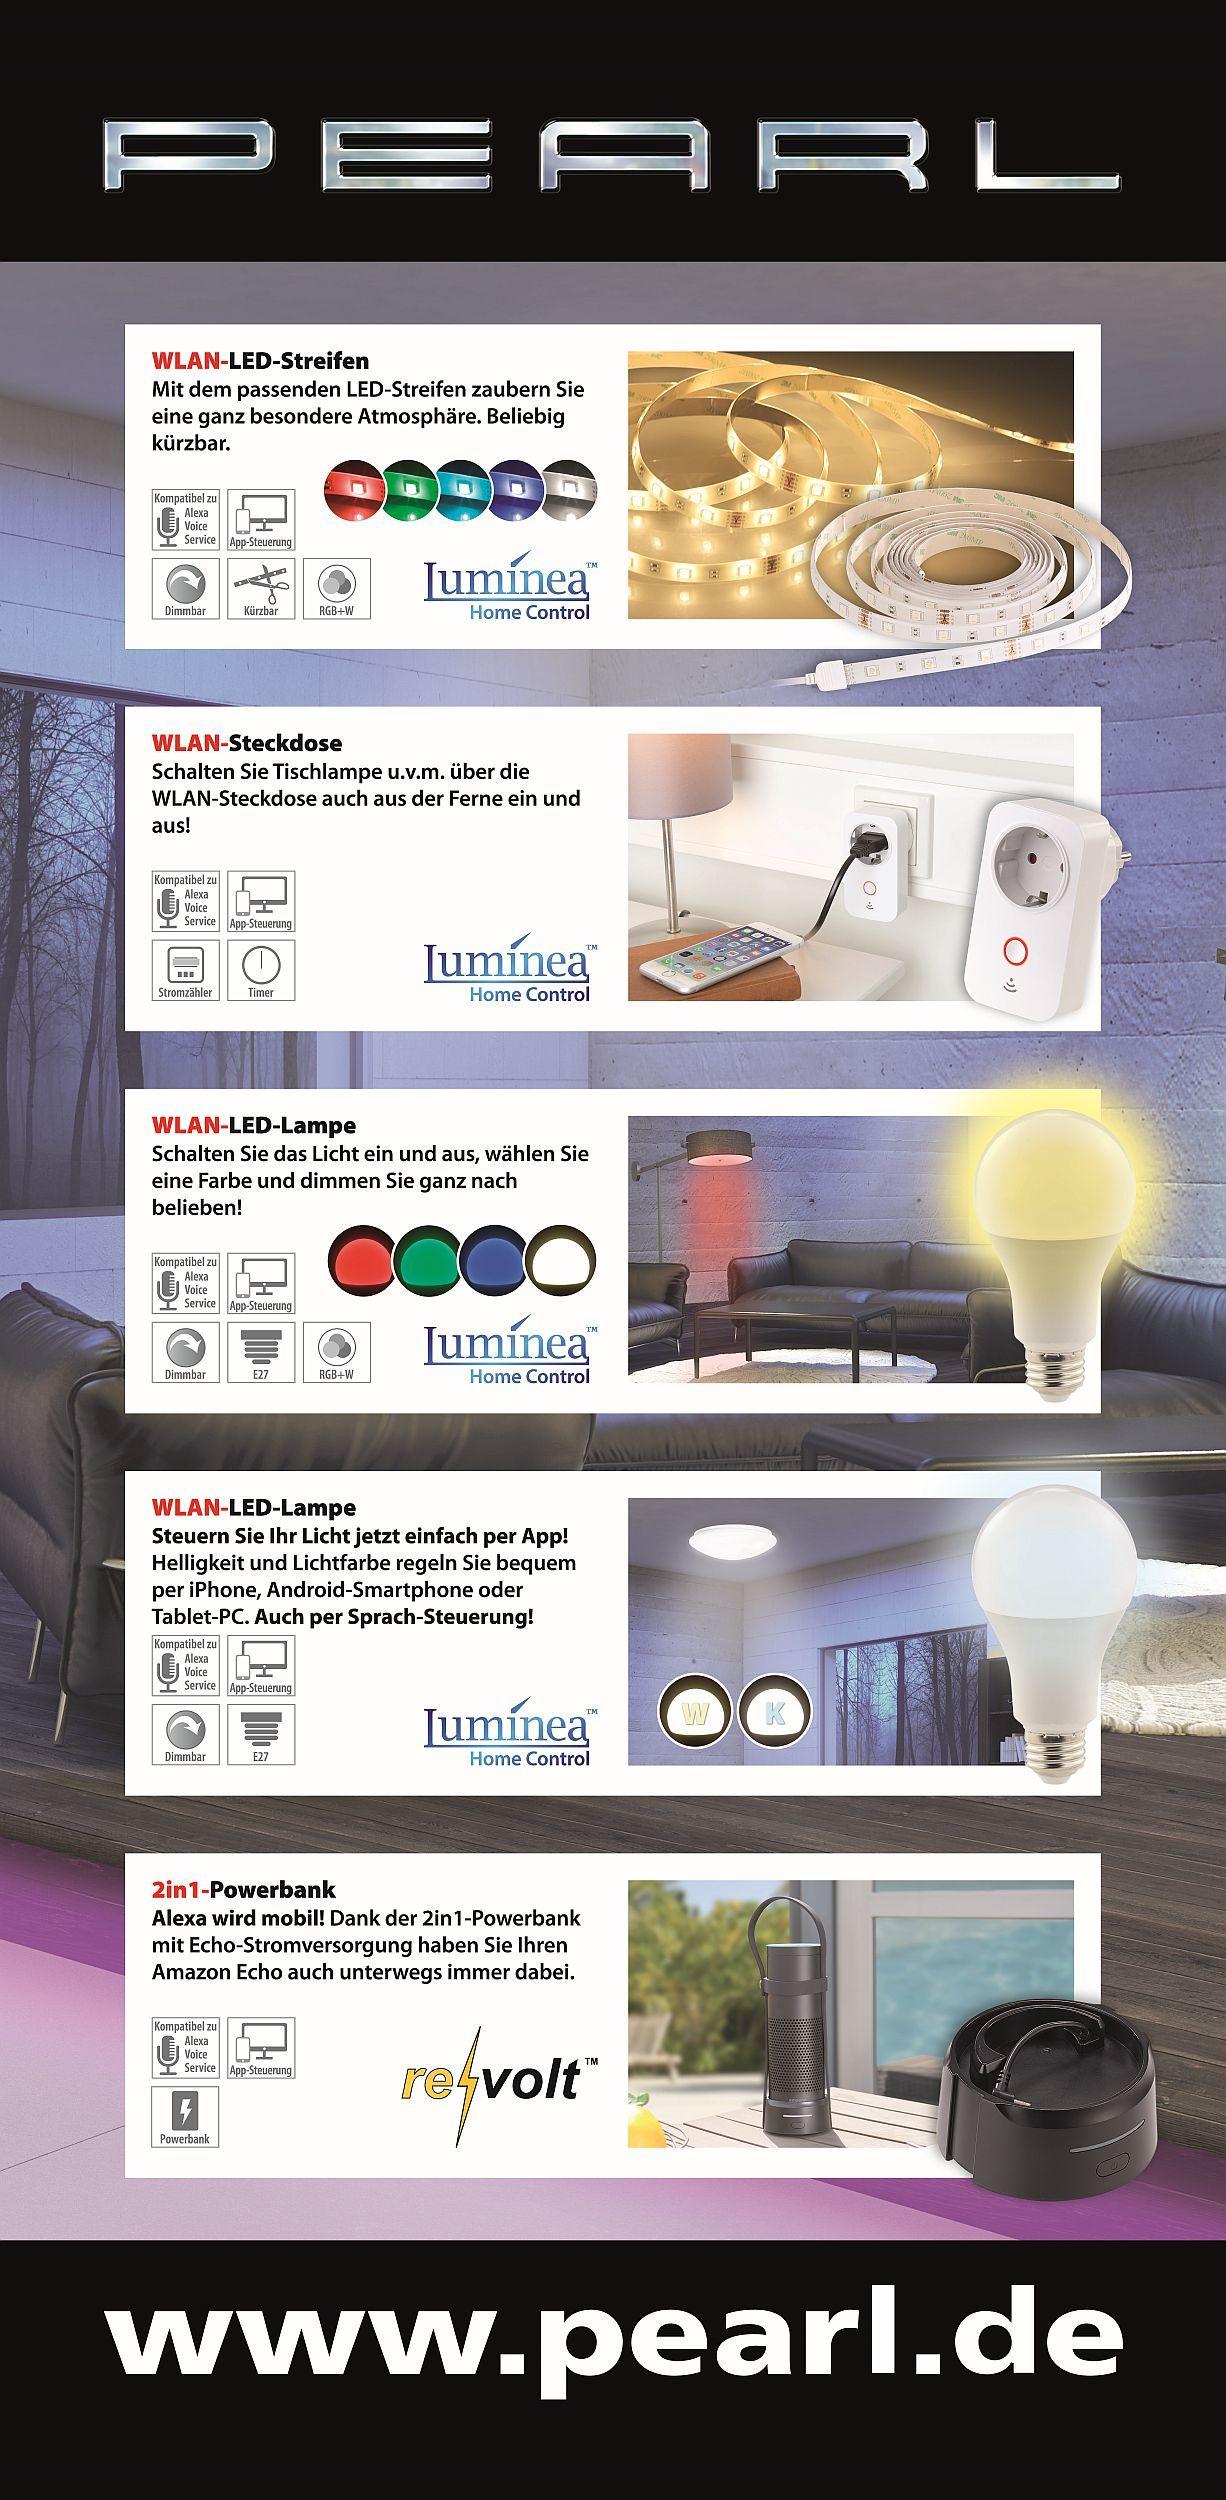 ZX-2832_Luminea_WLAN-LED-Lampe_Steuerung_per_Alexa_Voice_Service_E27_RGBW Spannende Lampen Per App Steuern Dekorationen